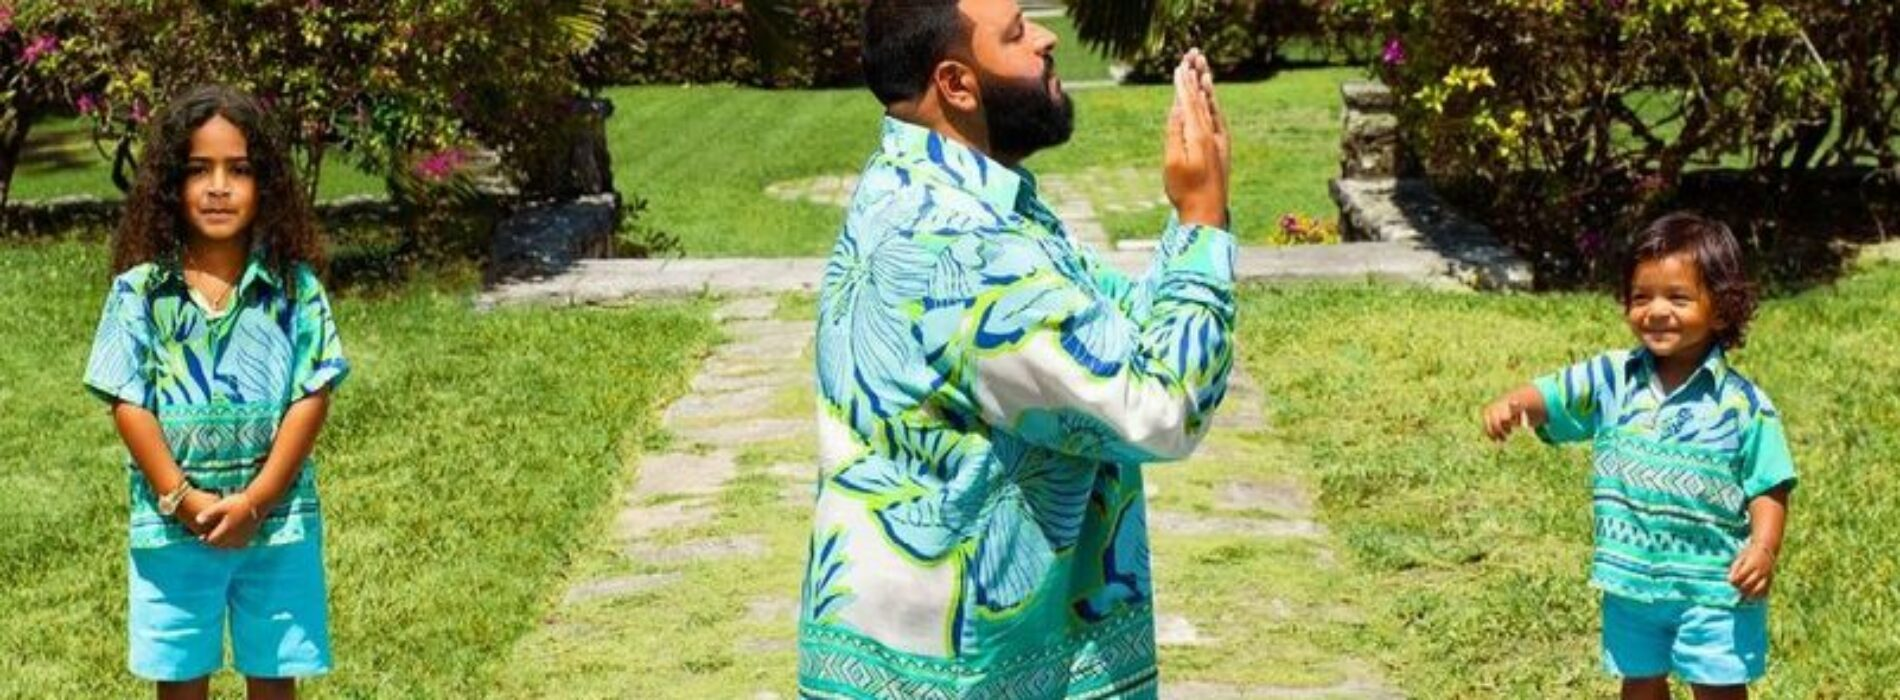 DJ Khaled est de retour avec un nouveau projet. Avec Cardi B, Jay'z, Buju Banton, Capleton, Bounty Killer, Migos, Justin Timberlake … (Official Audio) – Avril 2021